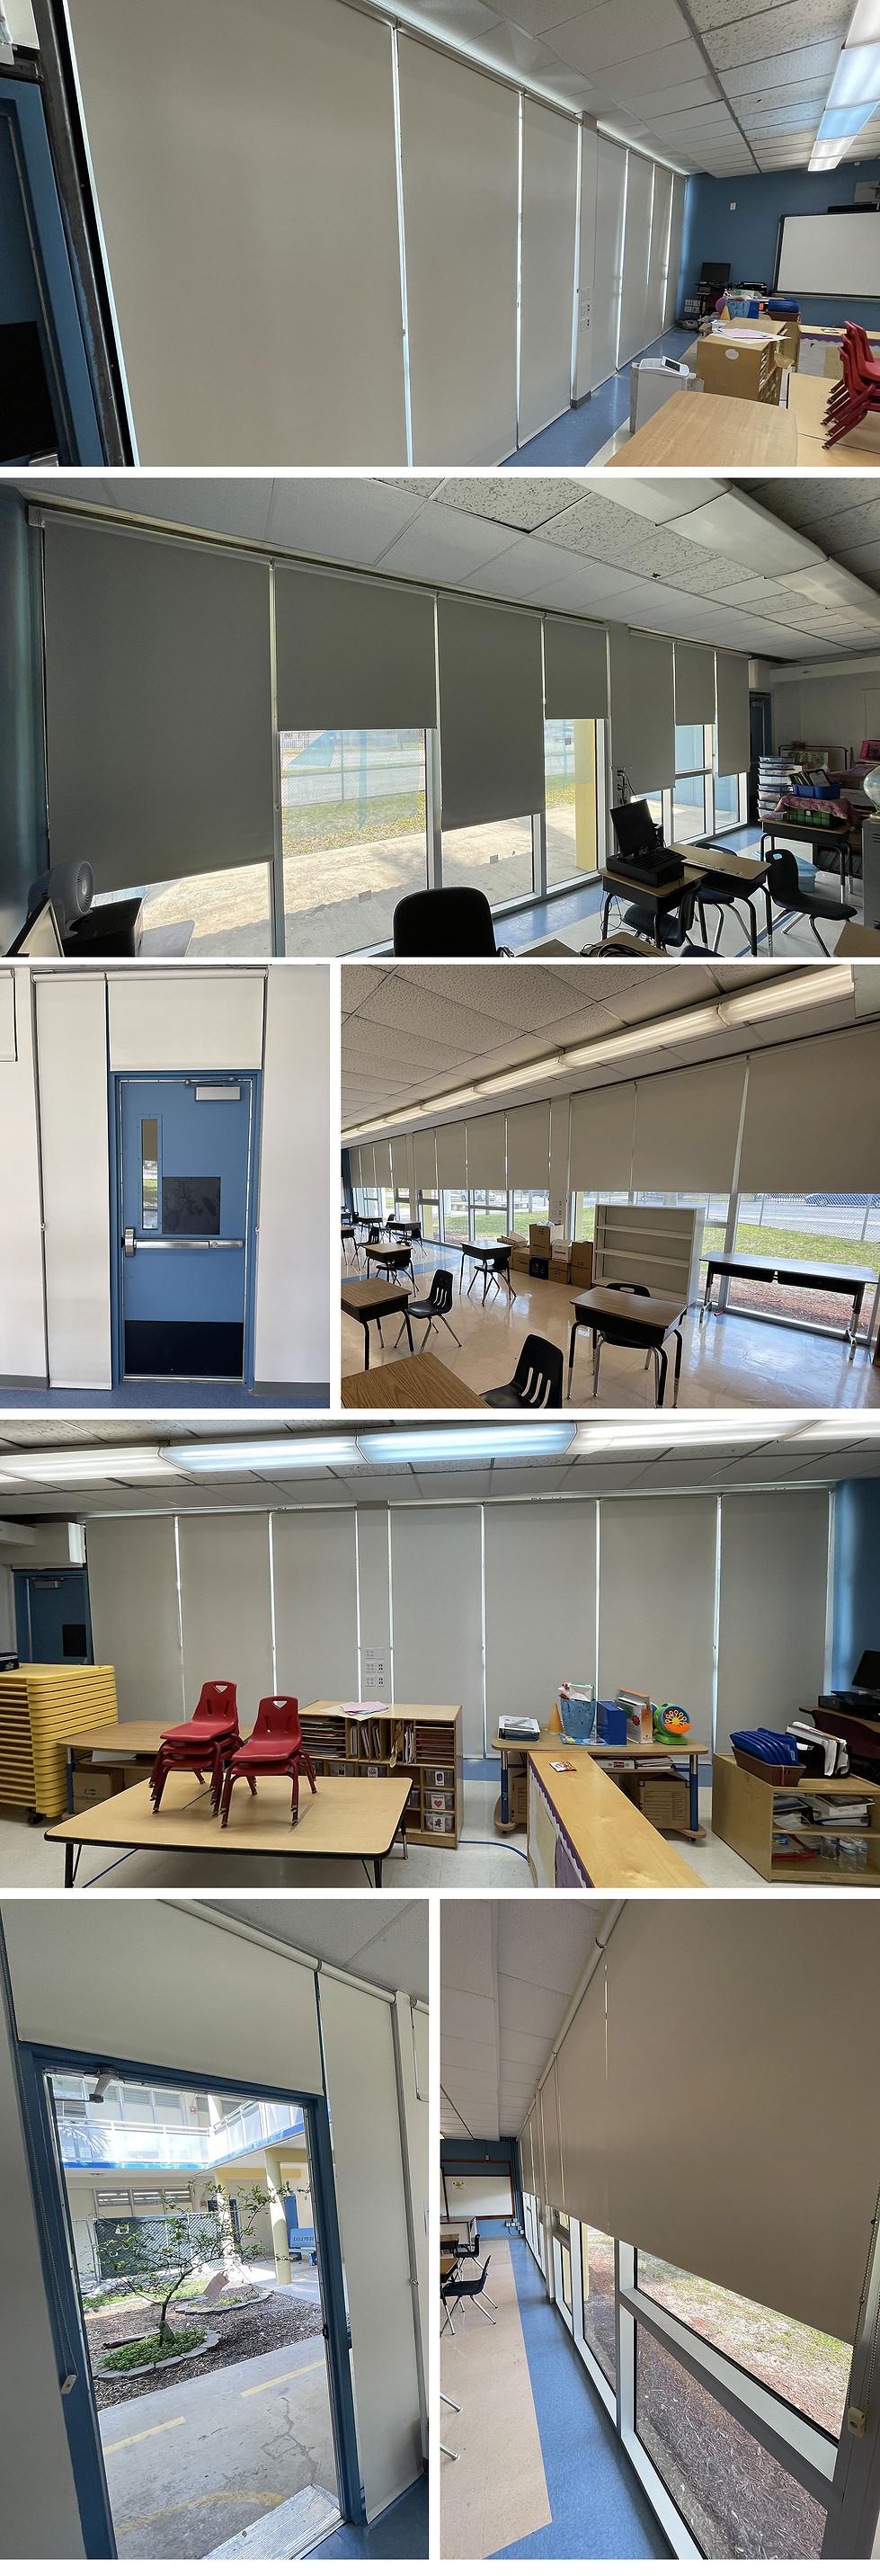 opa-locka-miami-elementary-school-commerical-window-roller-shades.jpg